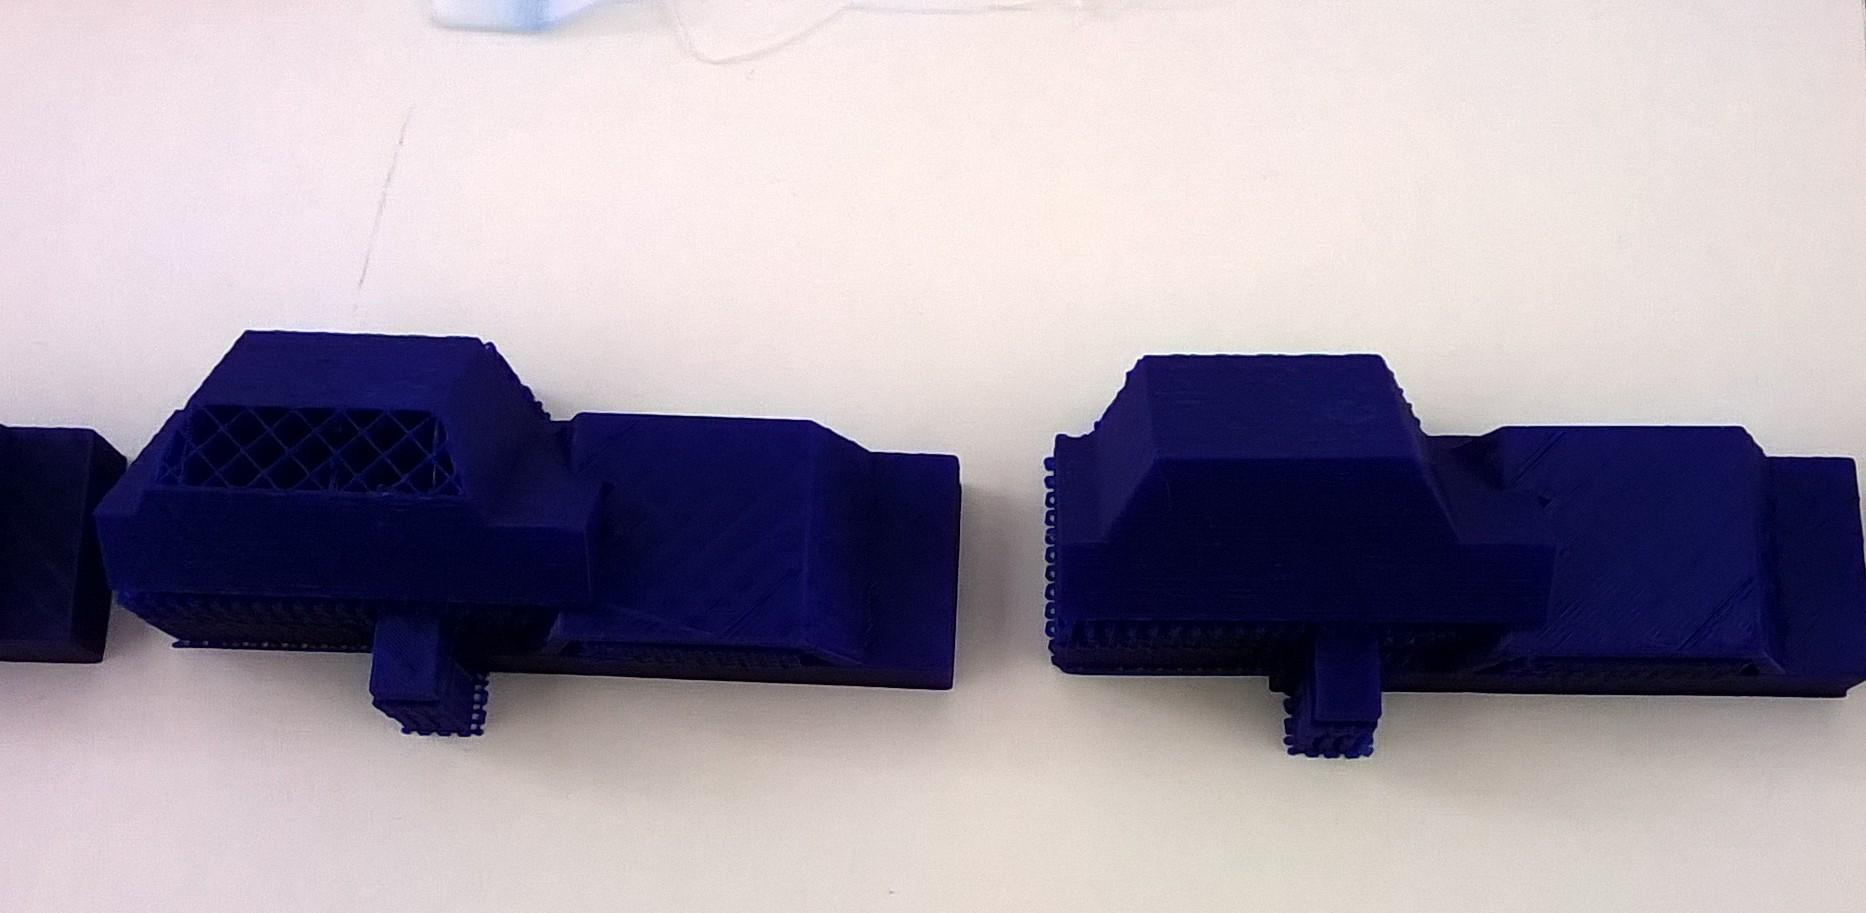 tte-016 / fasi di stampa